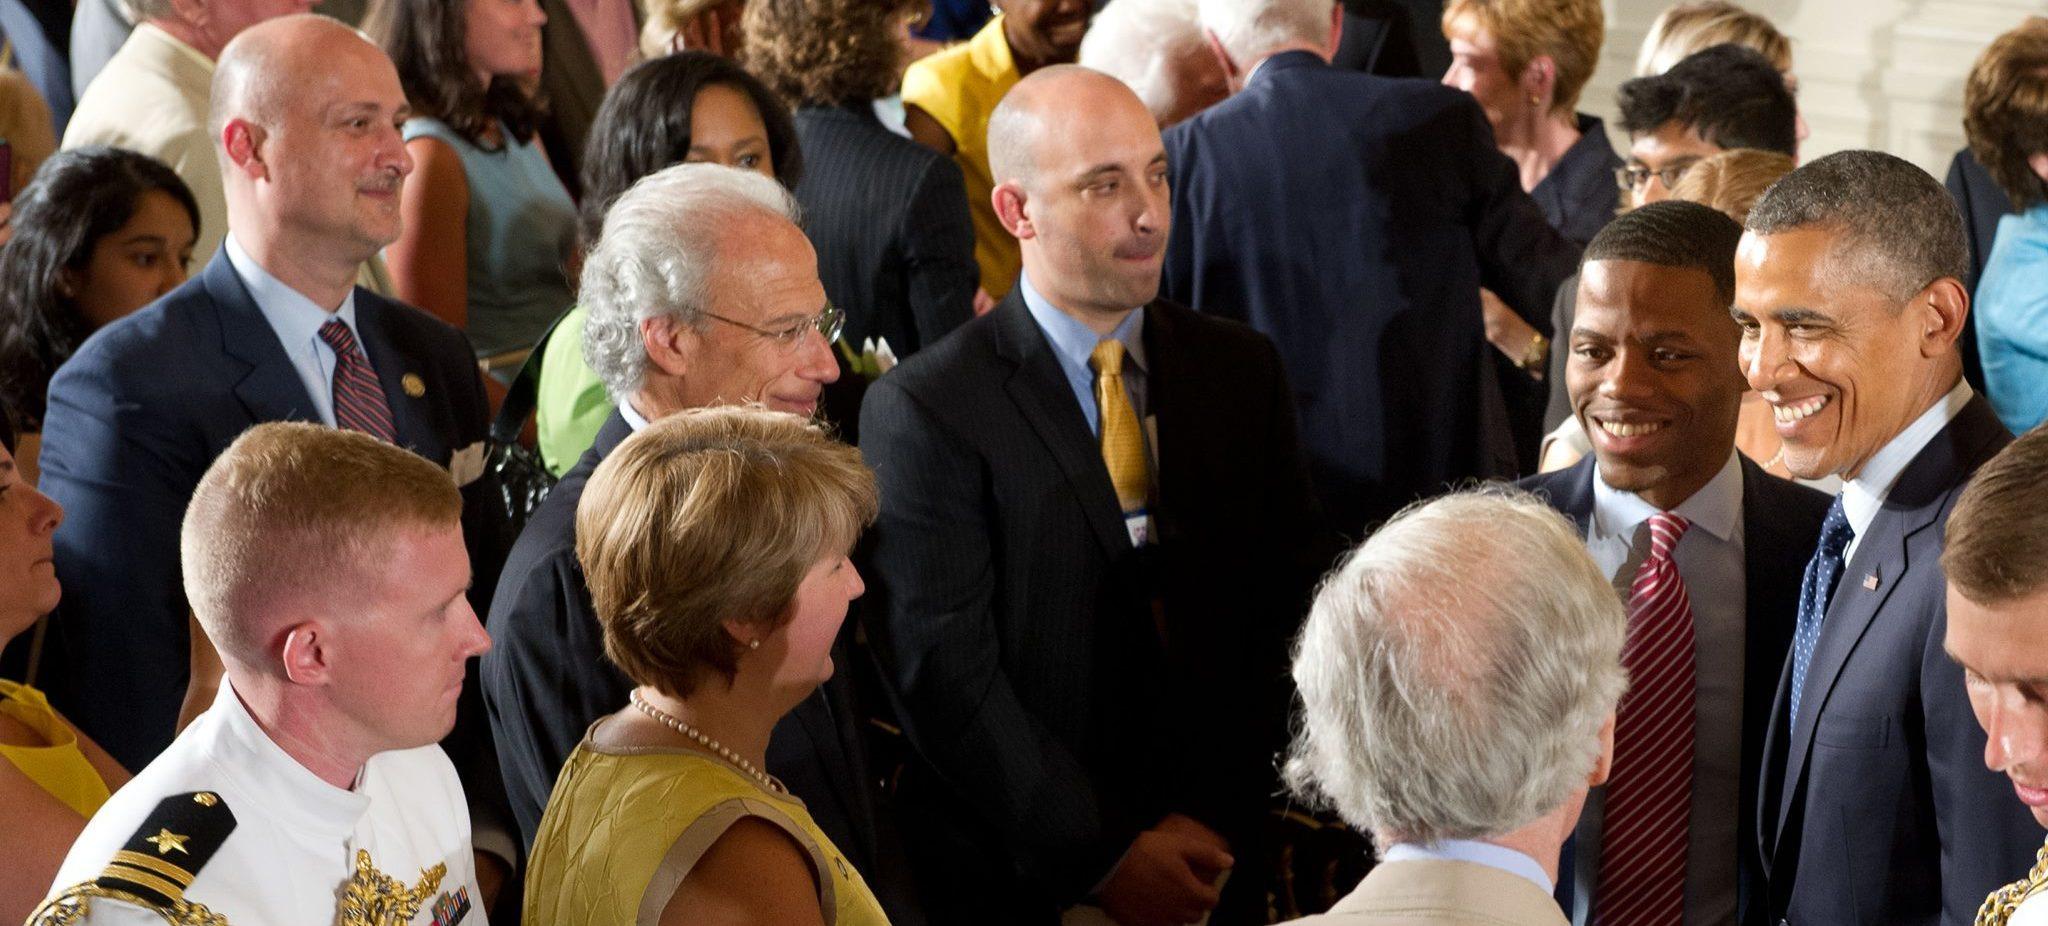 Derrius Quarles Honored By 43rd President President Barack Obama